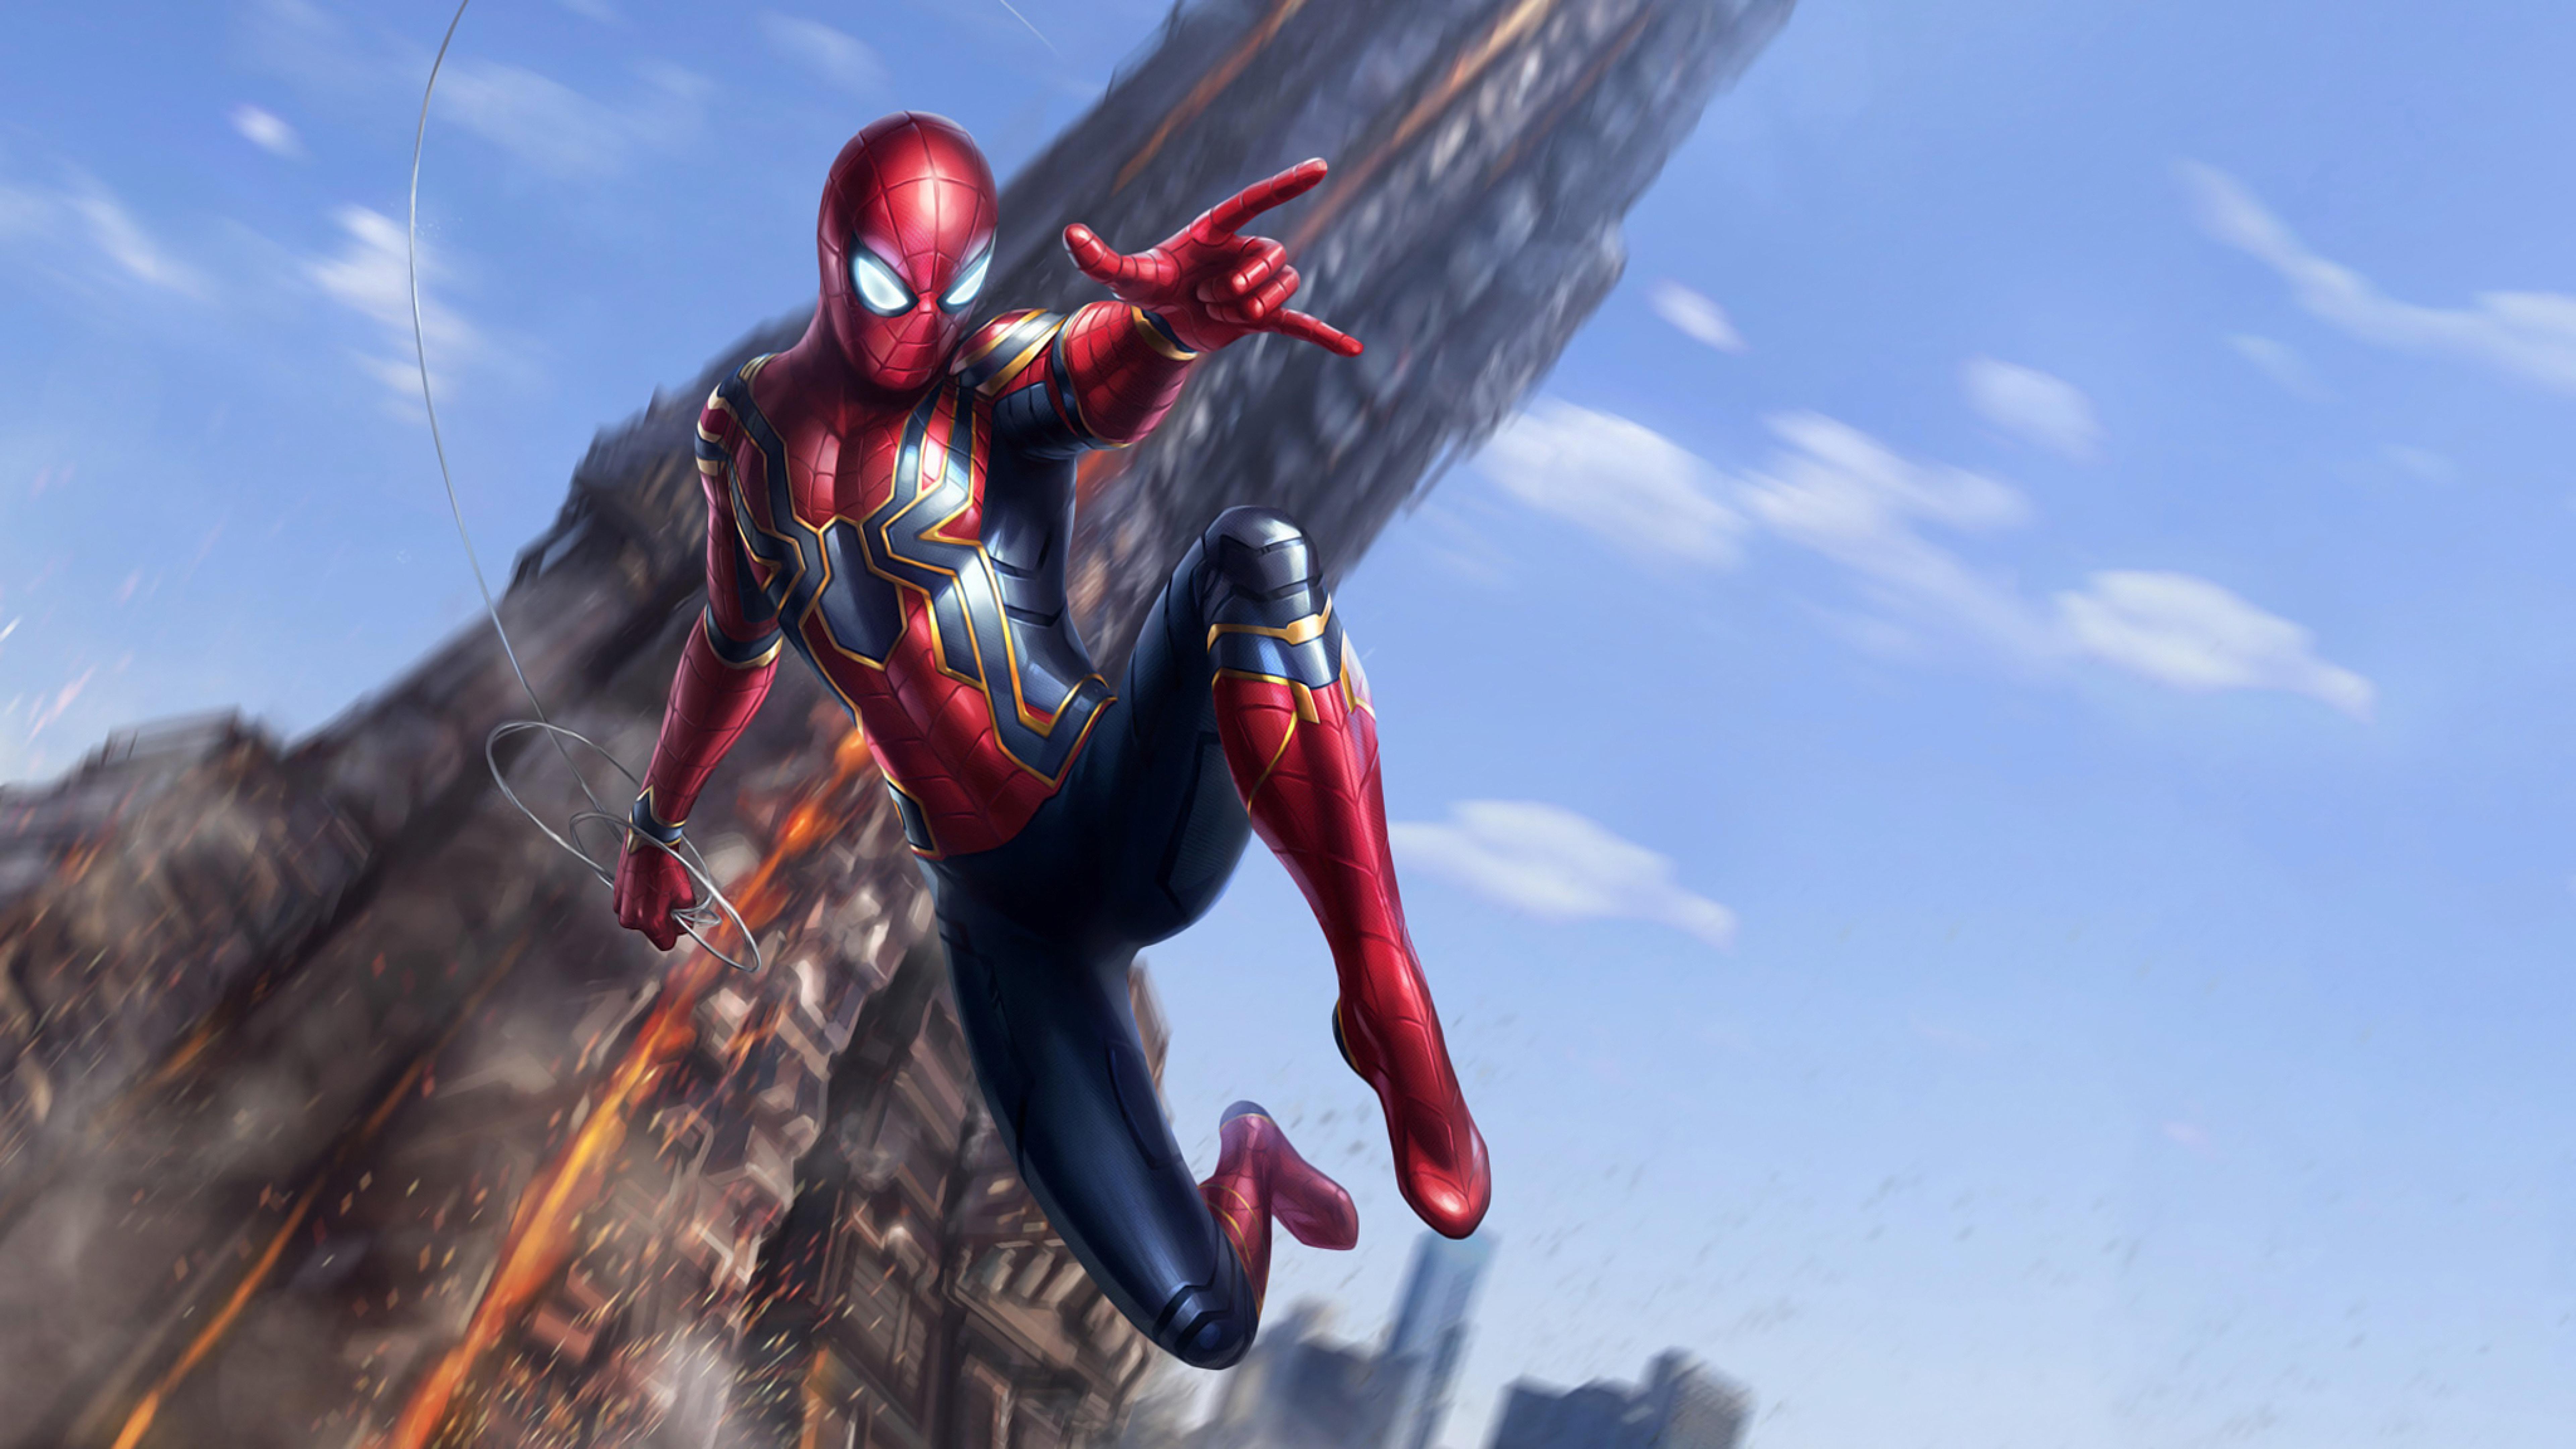 Iron spider avengers infinity war full hd 2k wallpaper - Spider man infinity war wallpaper ...